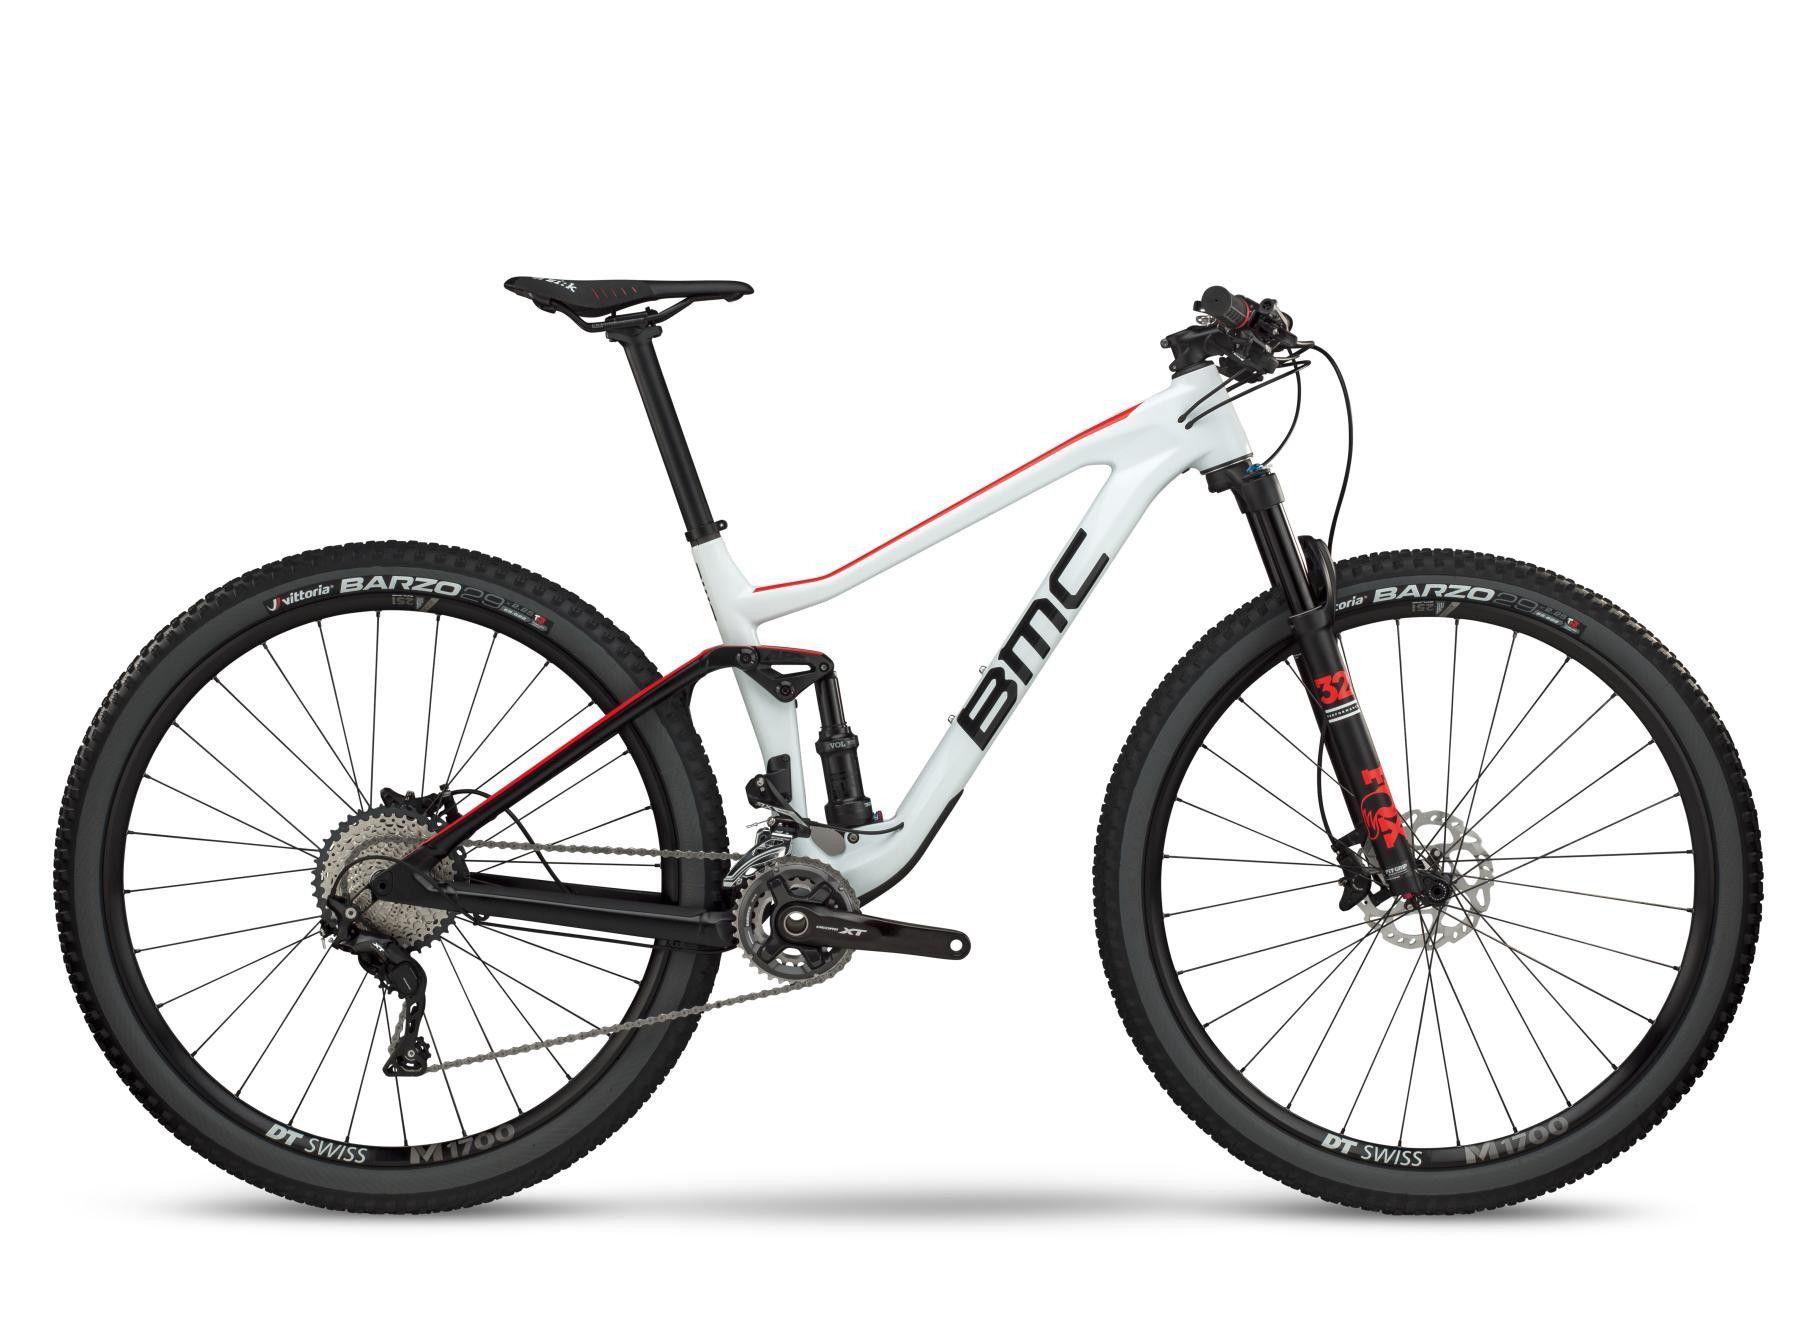 Bicicleta BMC aro 29 Agonist 02 One Carbon Full 22V